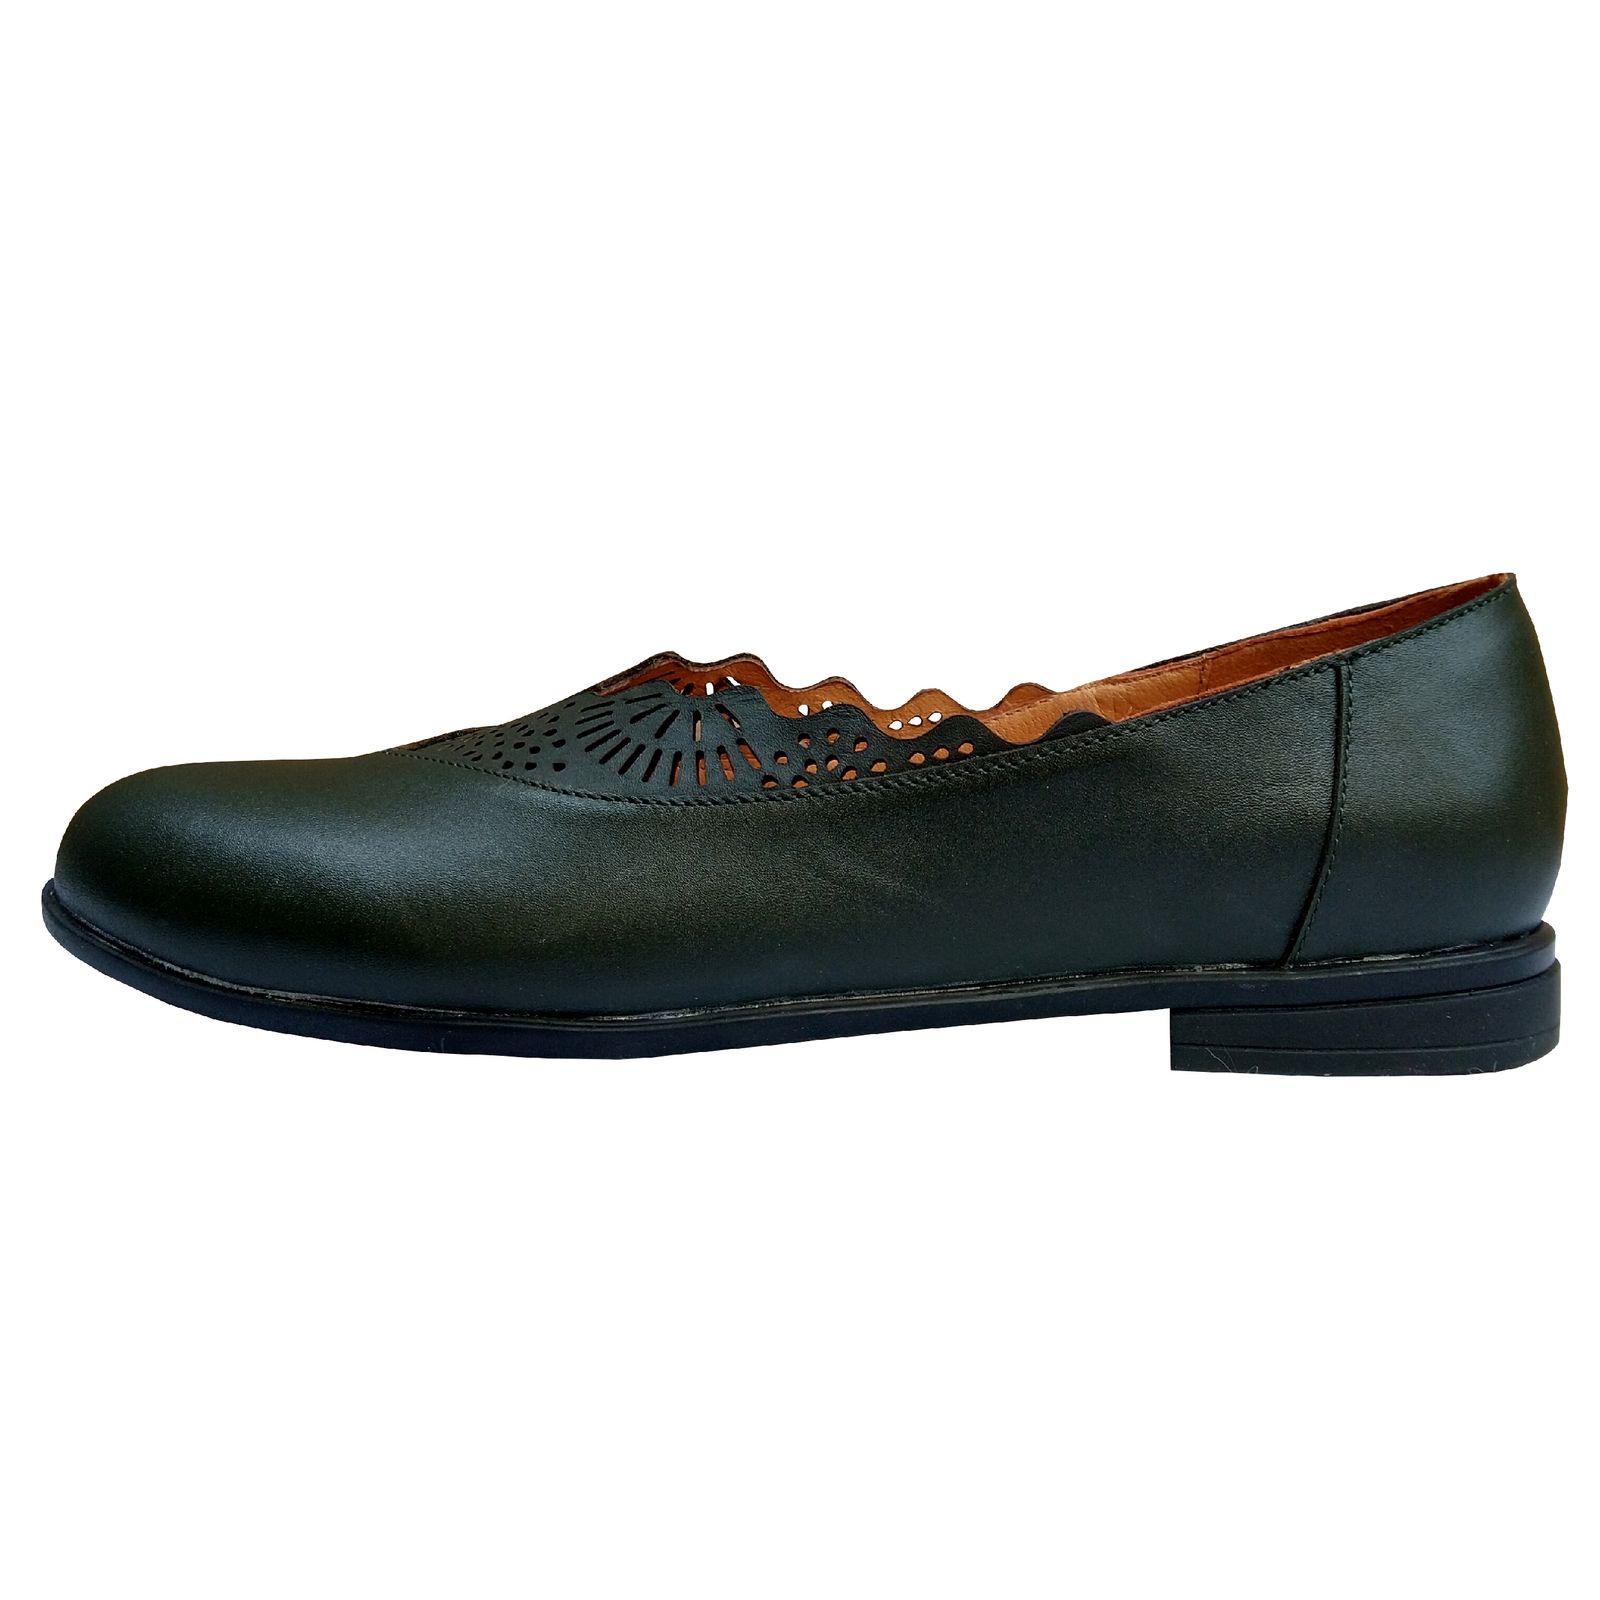 کفش زنانه مدل SK 308 -  - 2